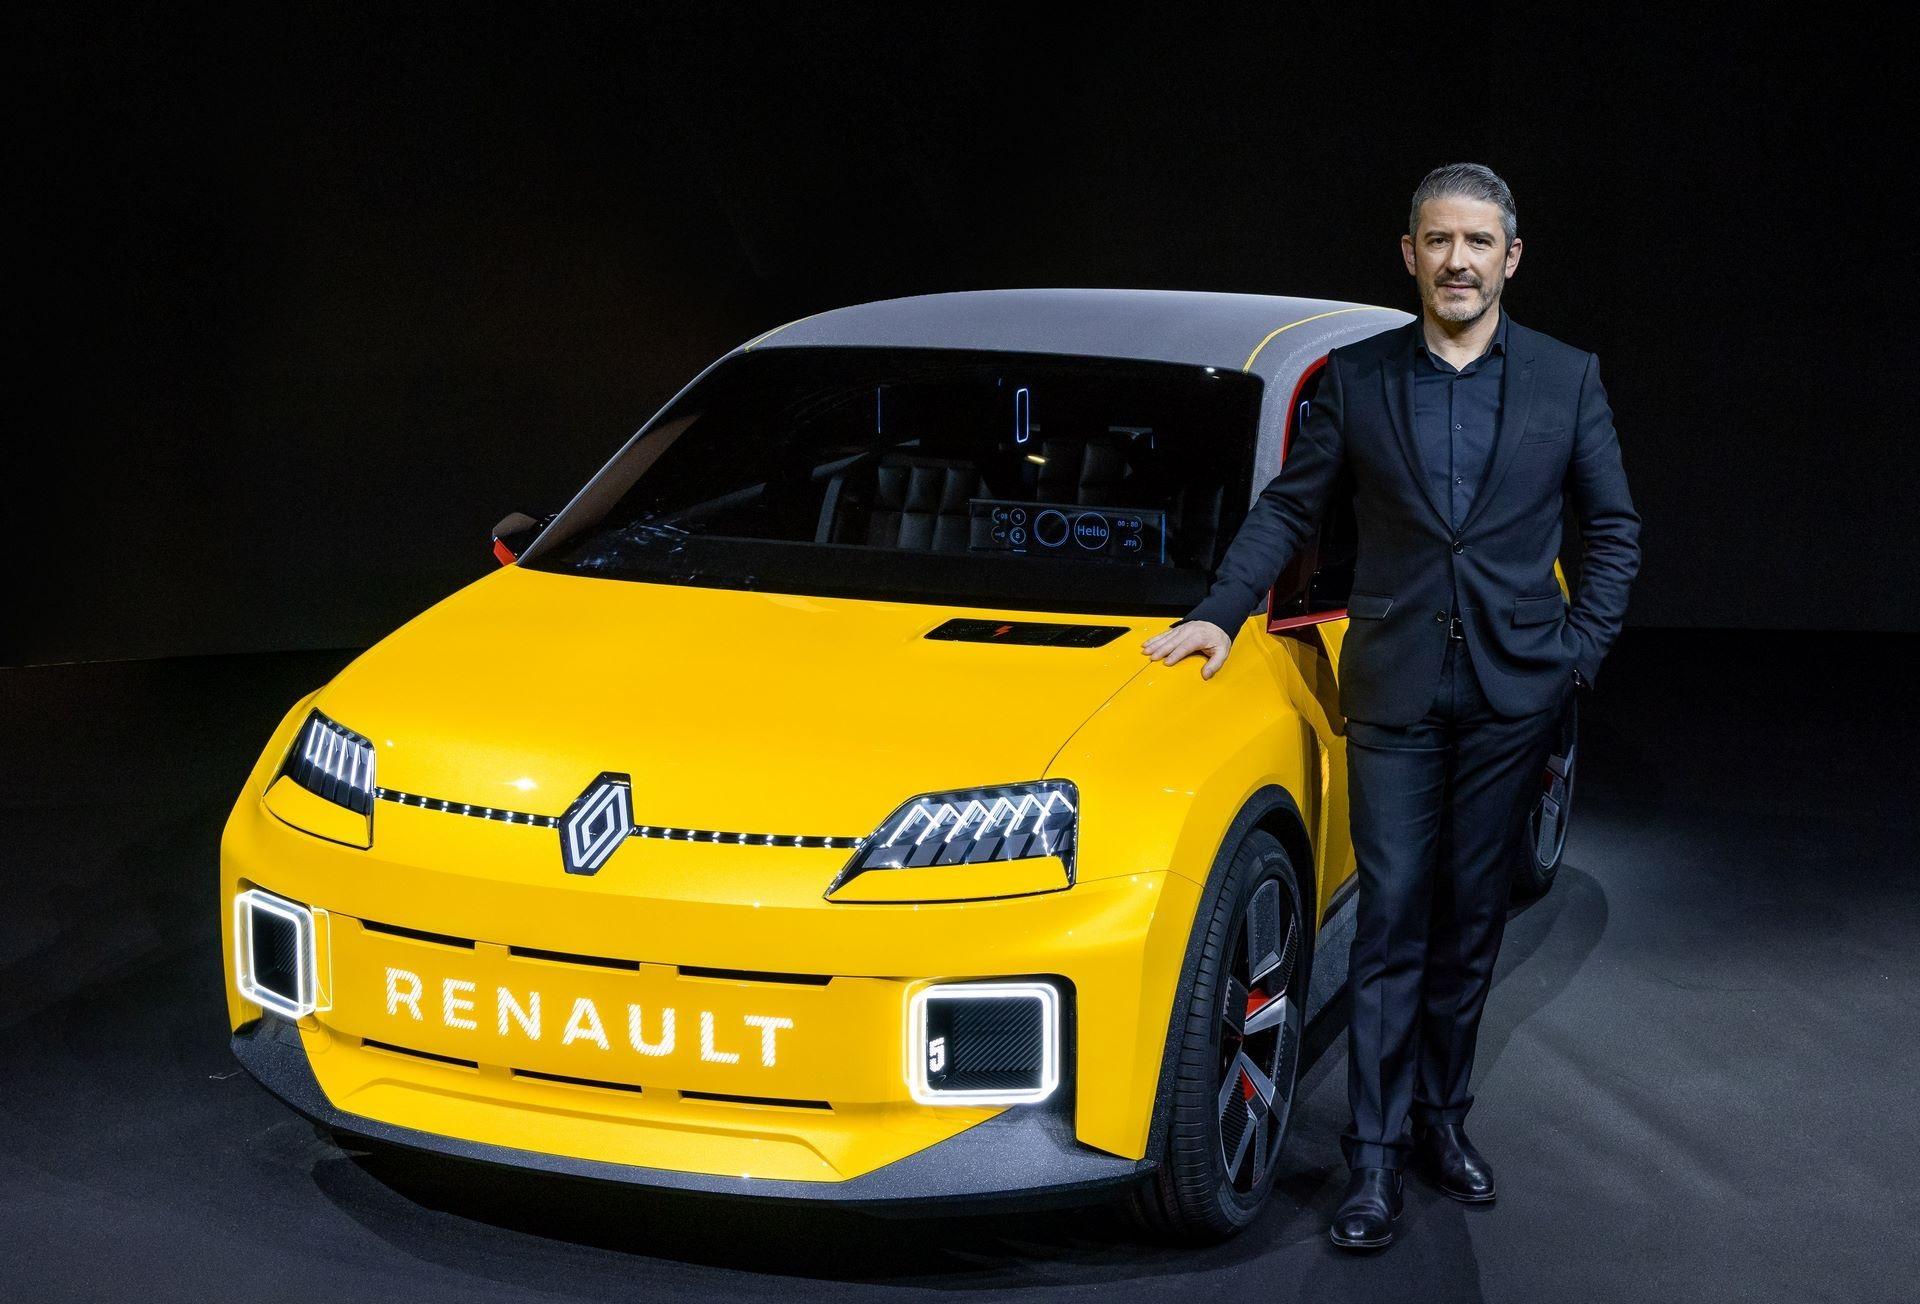 30-2021-Renault-5-Prototype-and-Gilles-VIDAL-designer